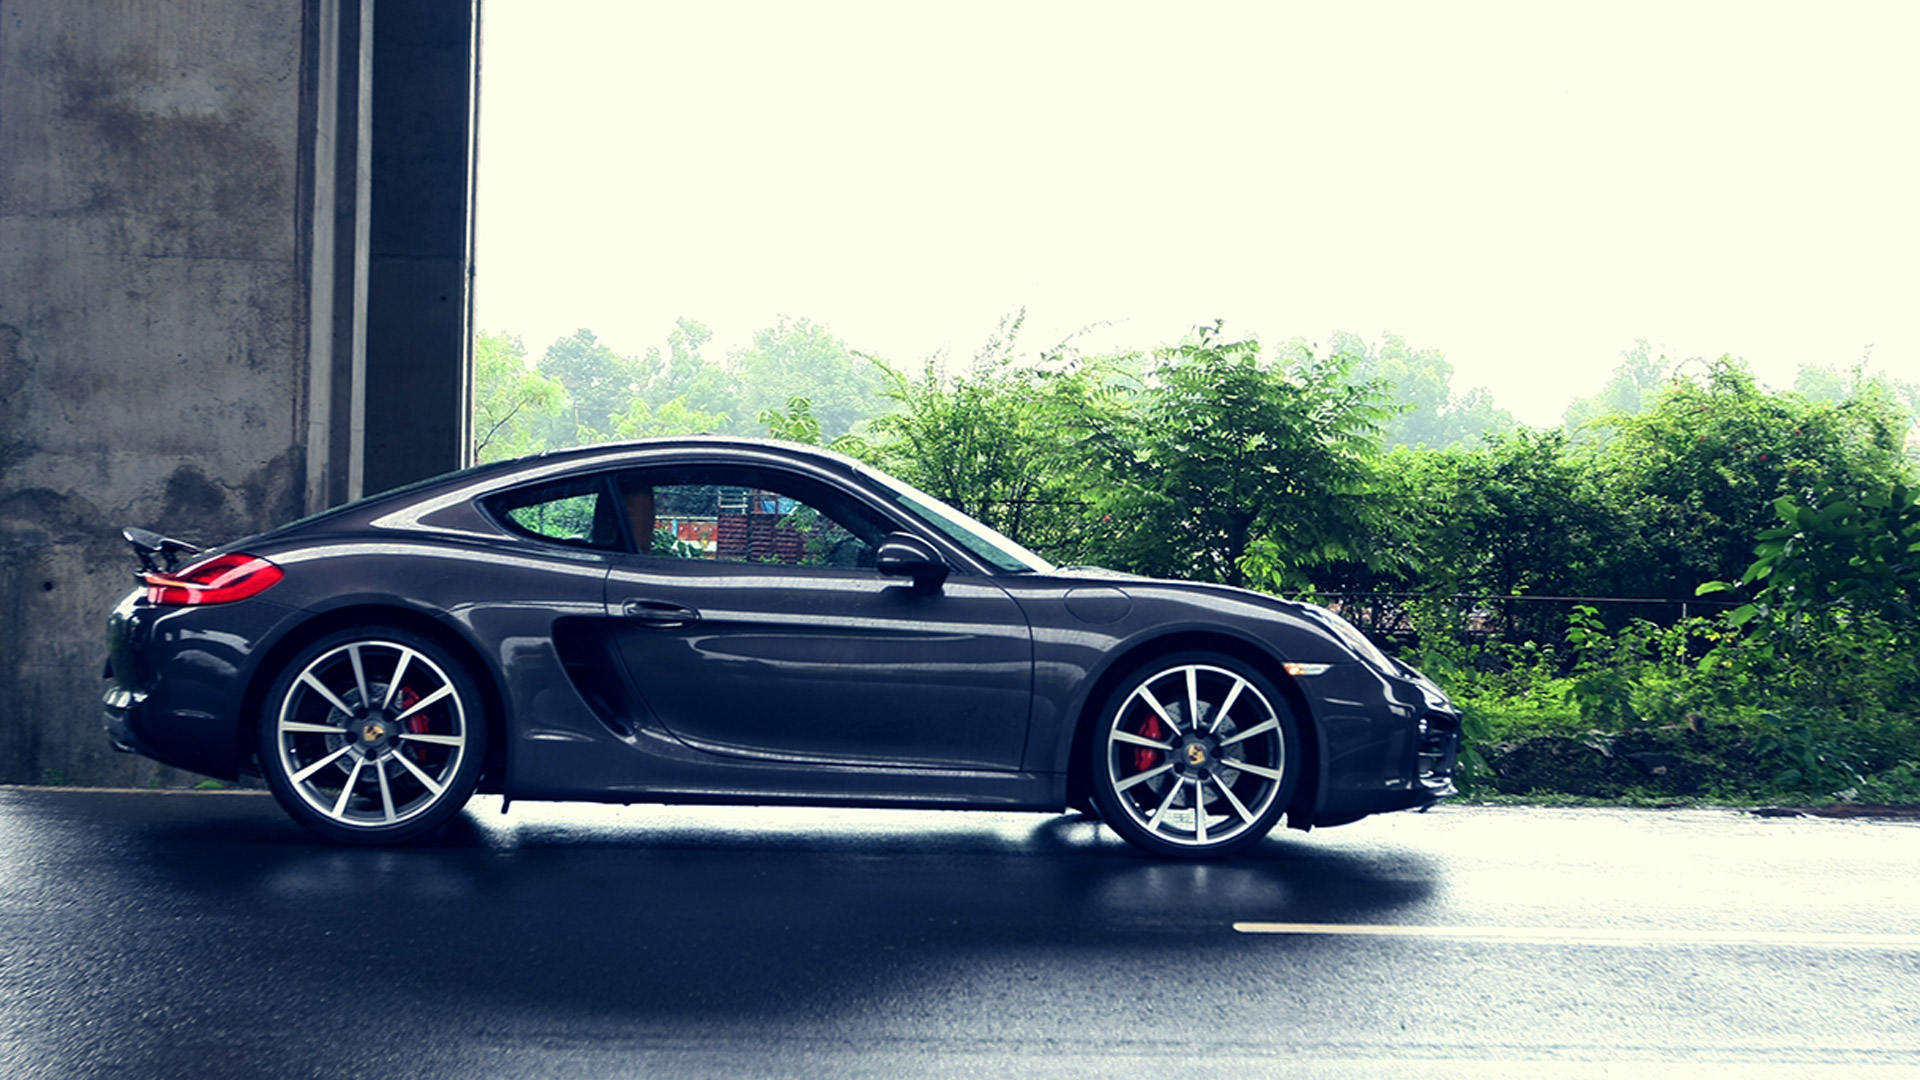 Porsche Cayman 2015 S Exterior